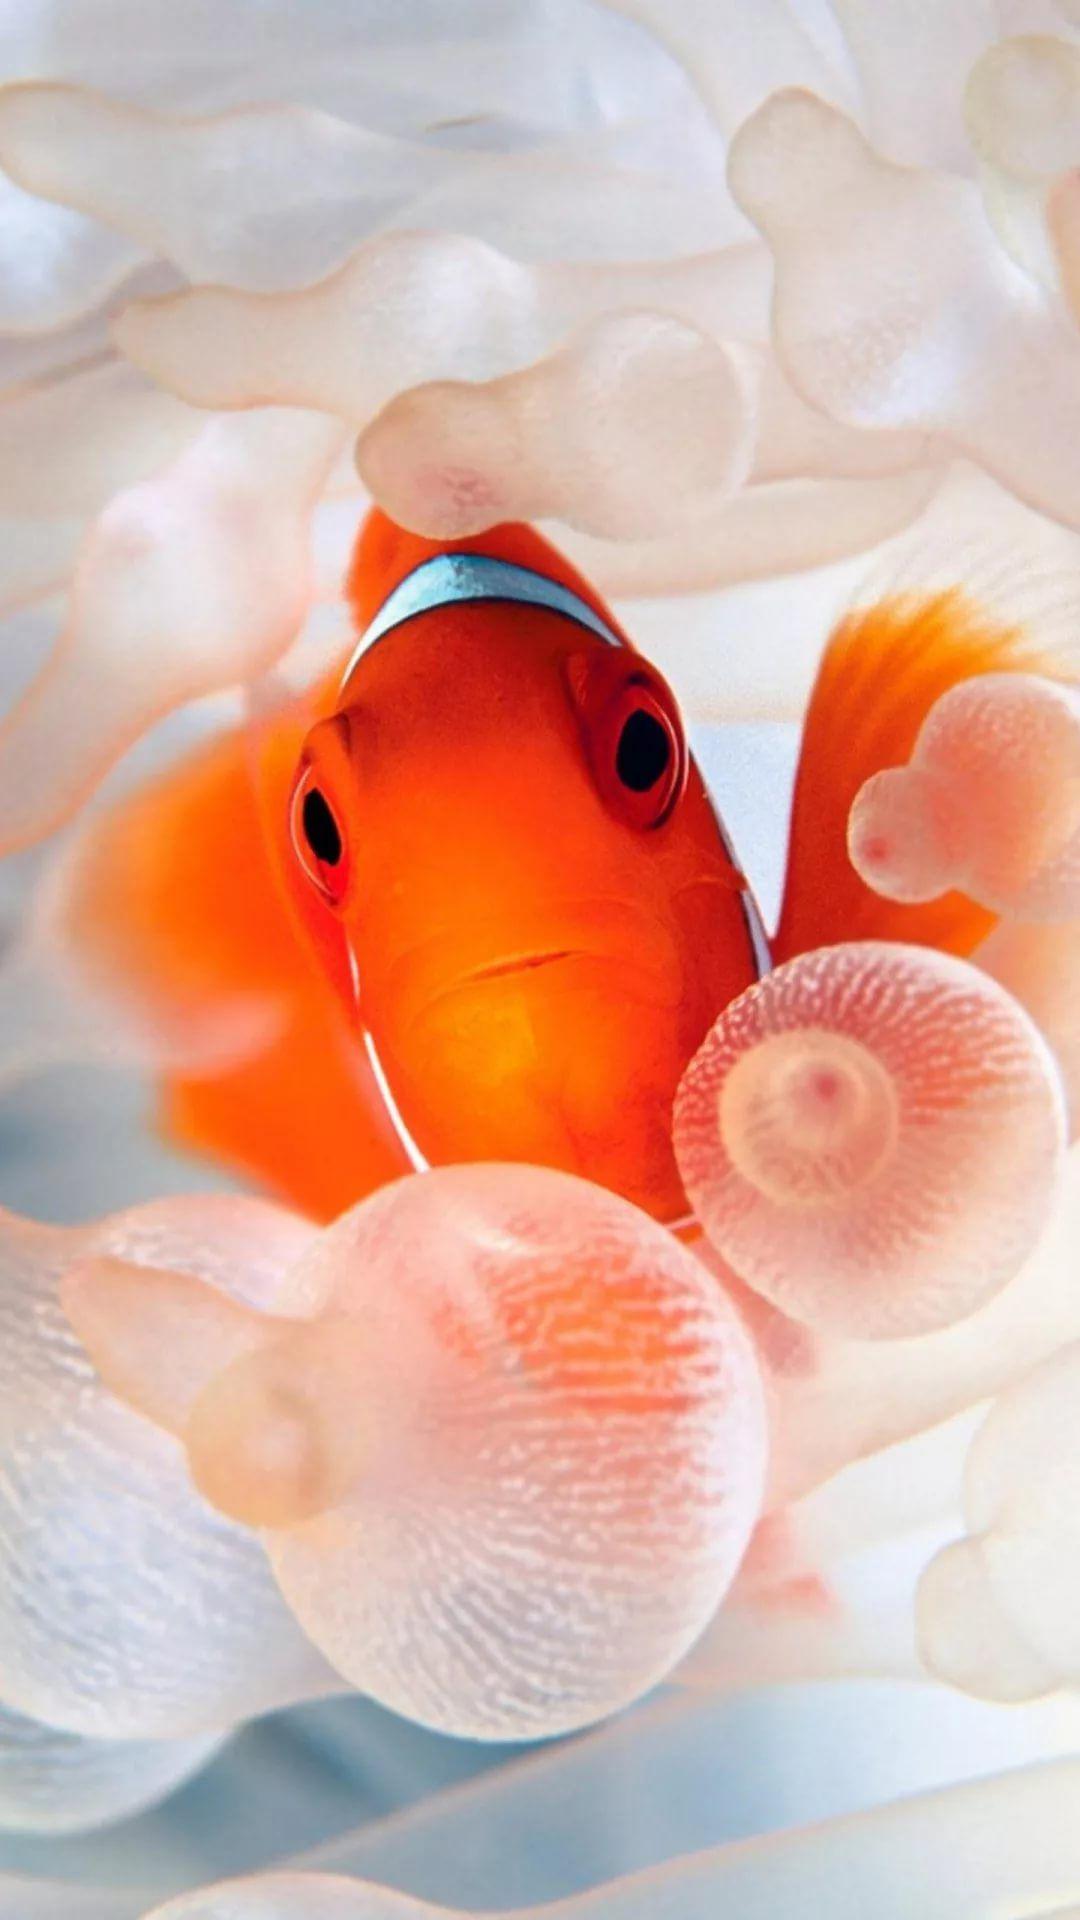 Free Tropical Fish wallpaper 1080x1920